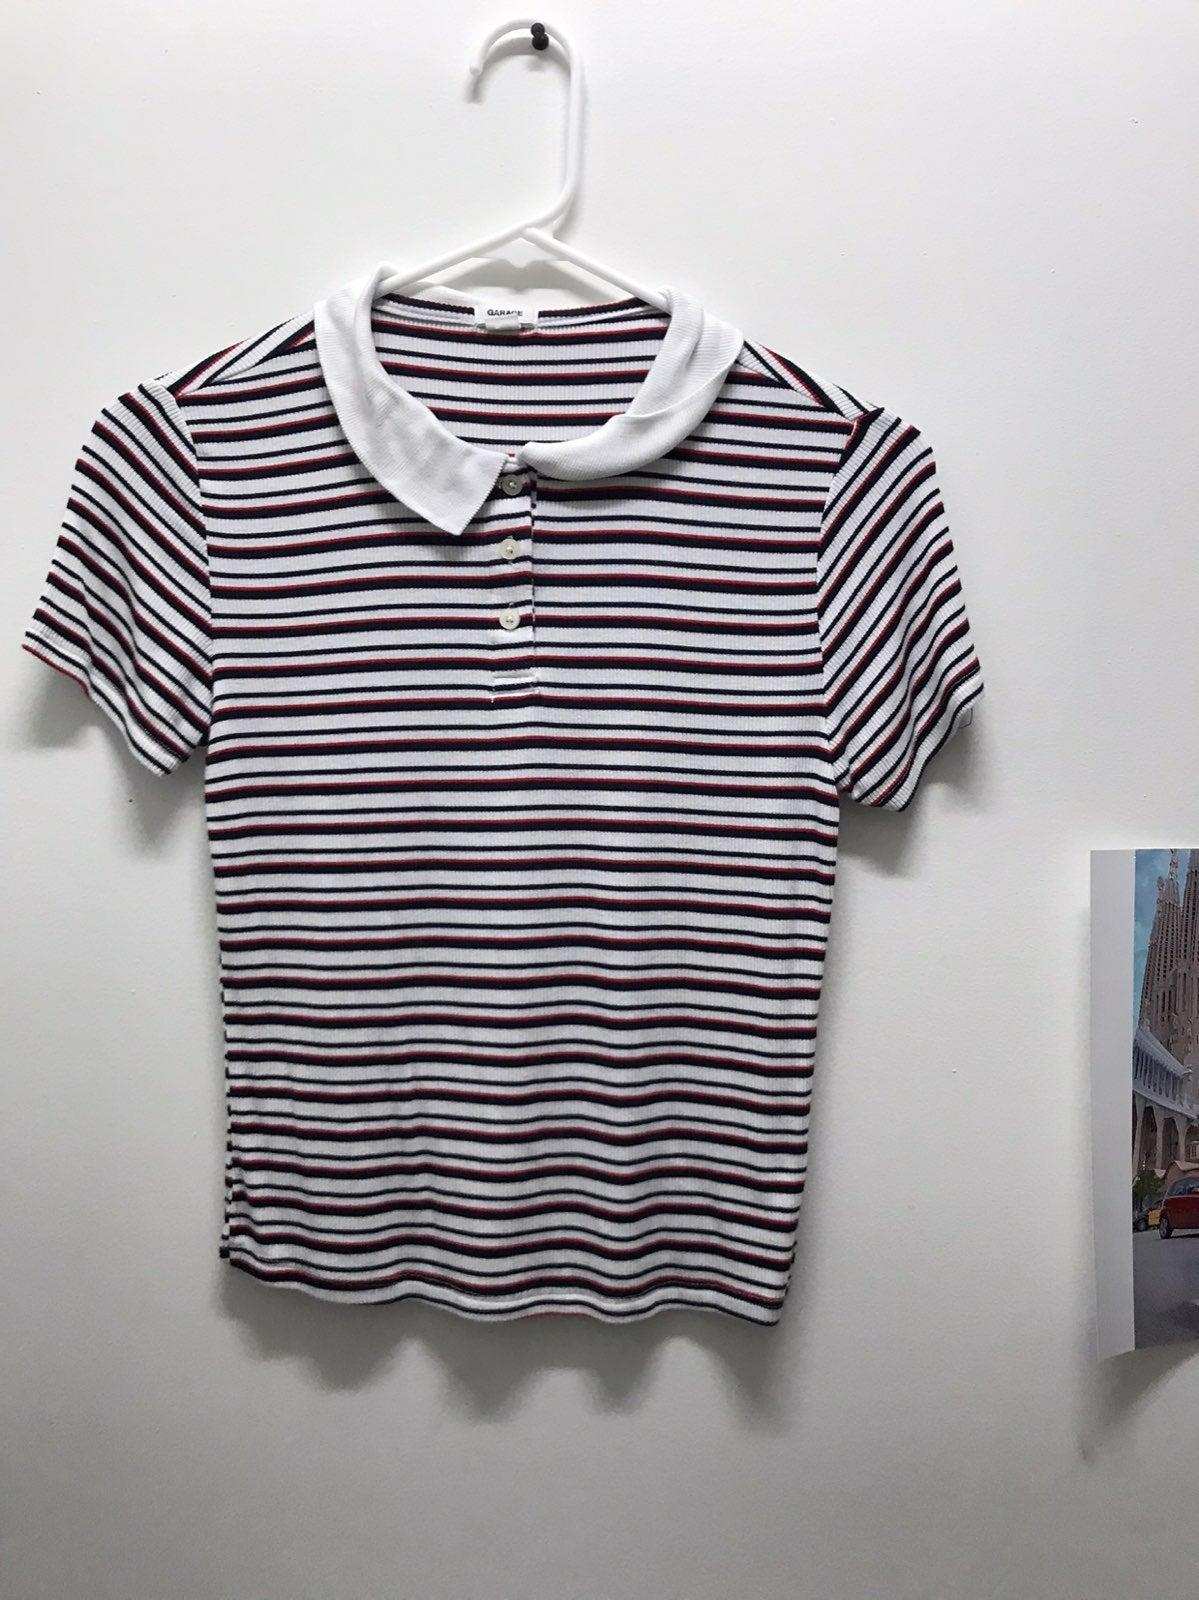 Garage tshirt